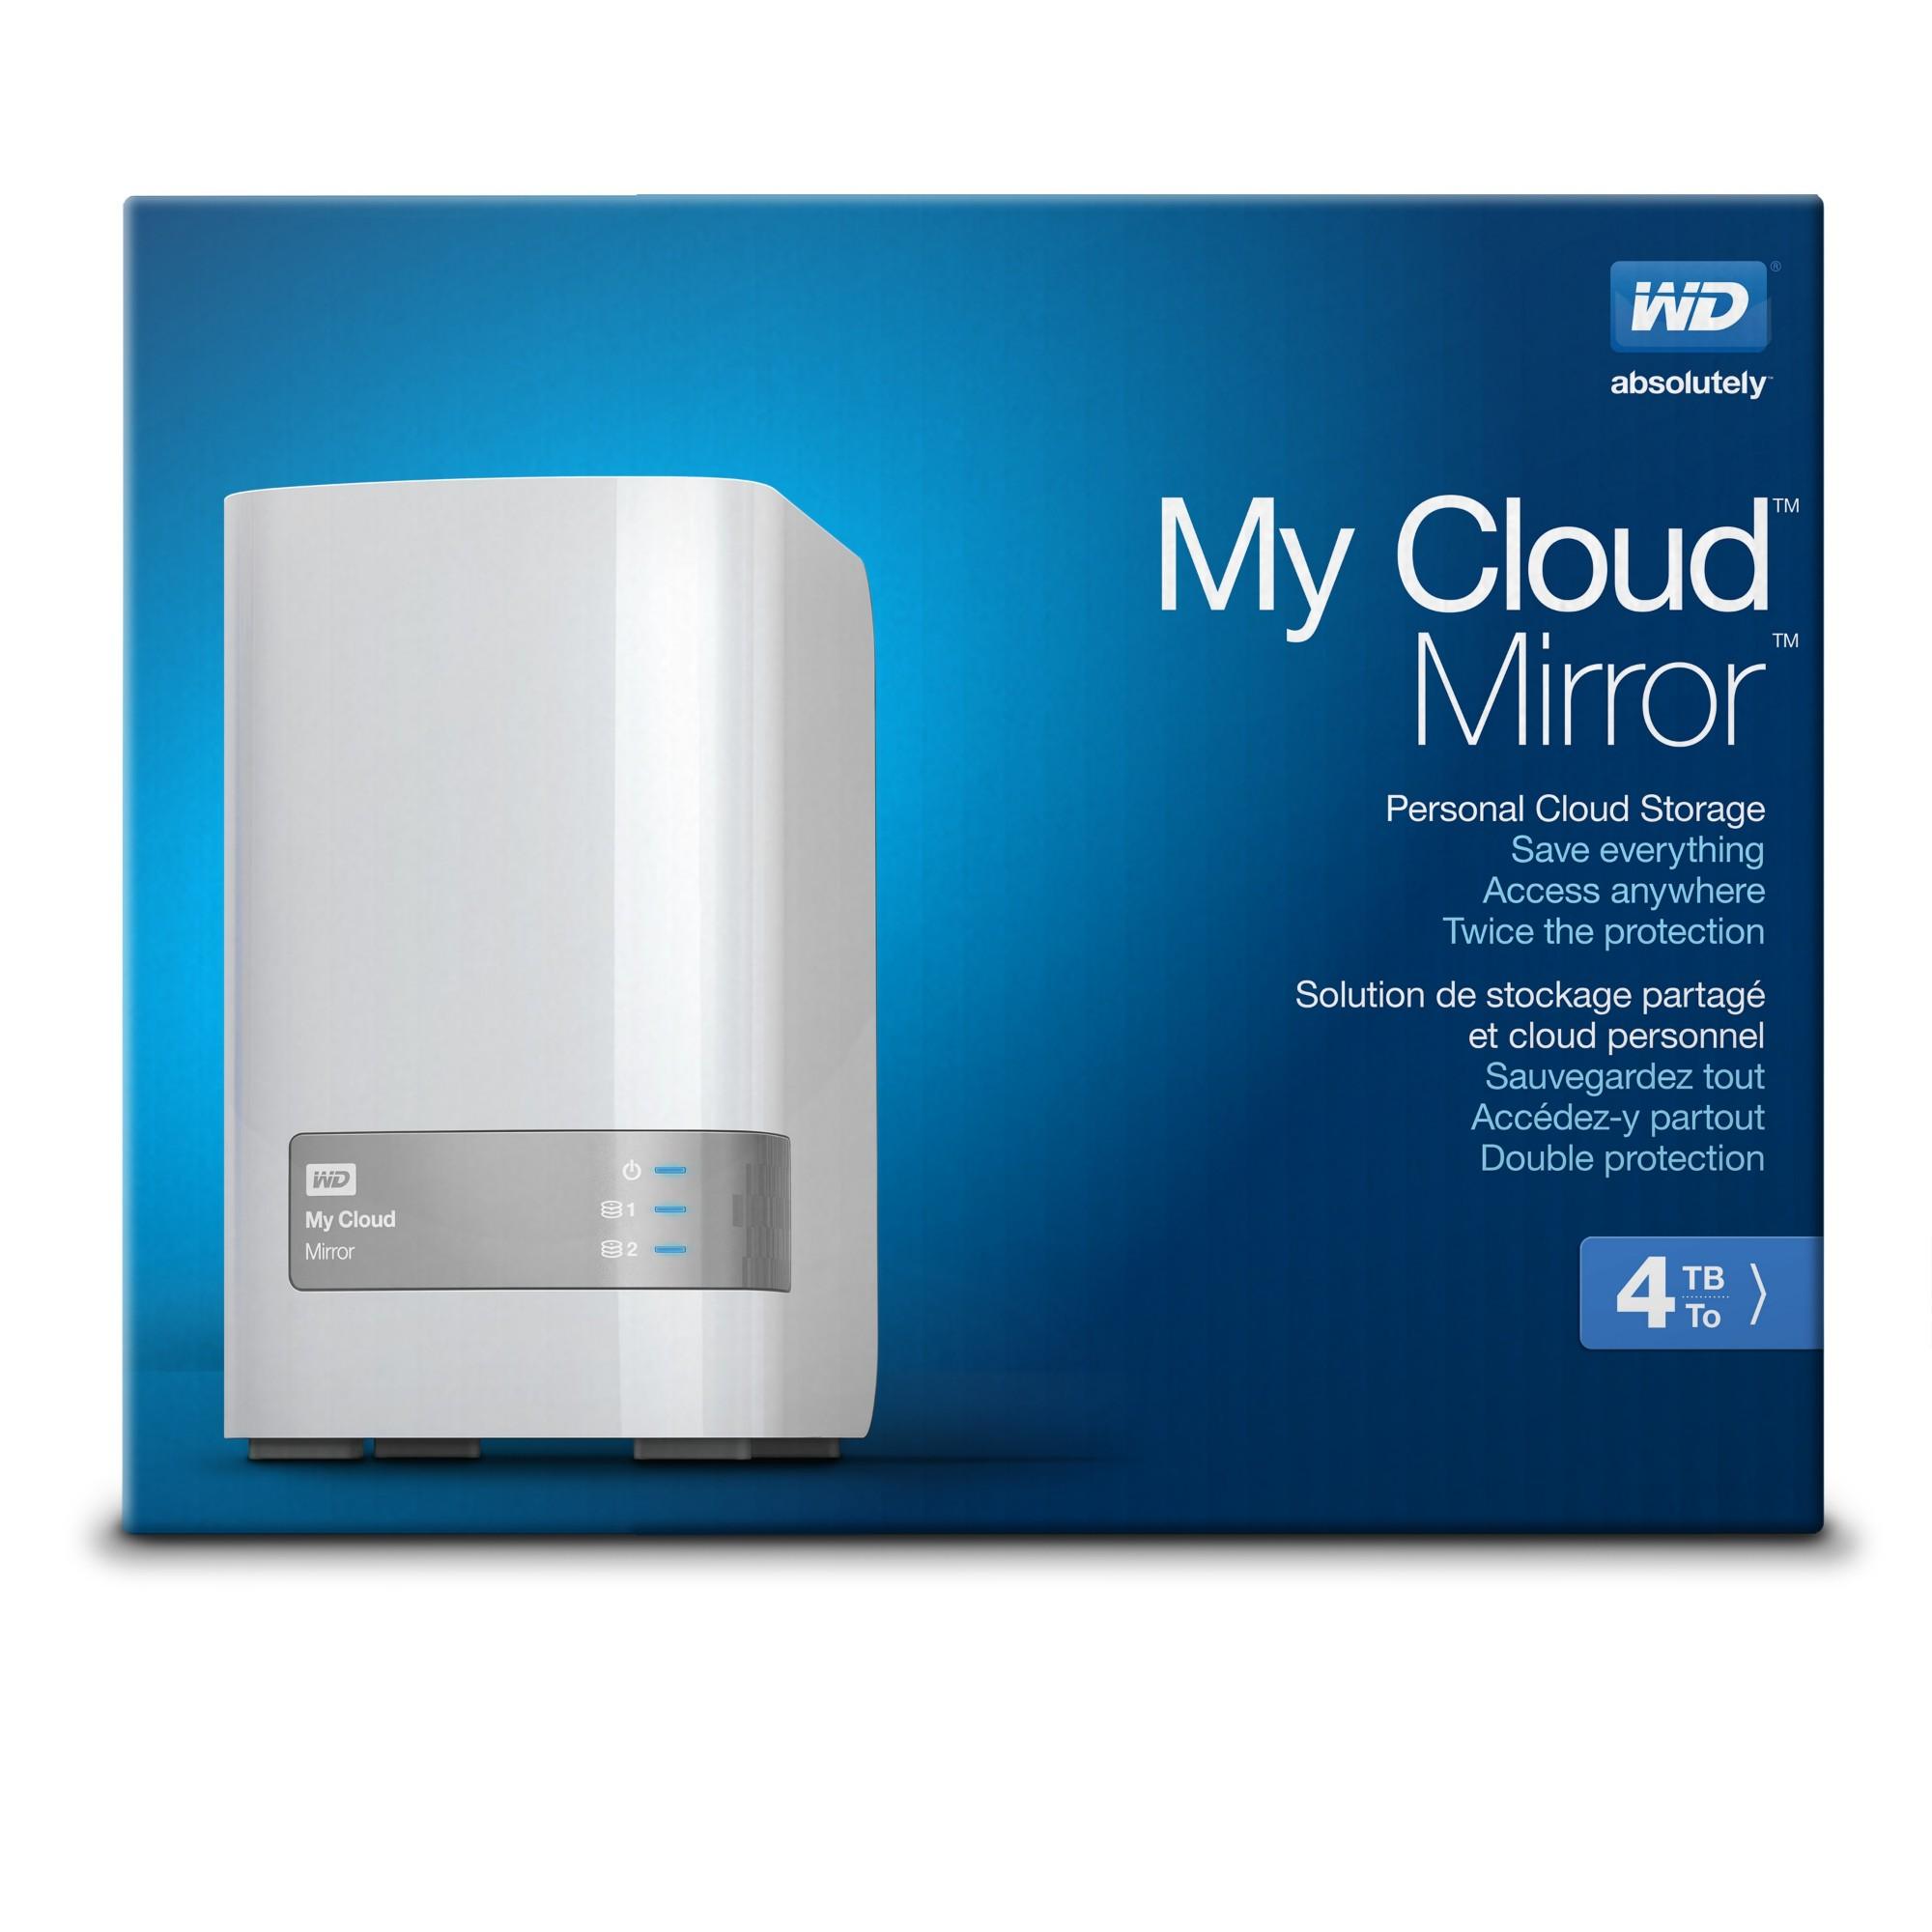 western digital my cloud mirror 4 tb storage server. Black Bedroom Furniture Sets. Home Design Ideas